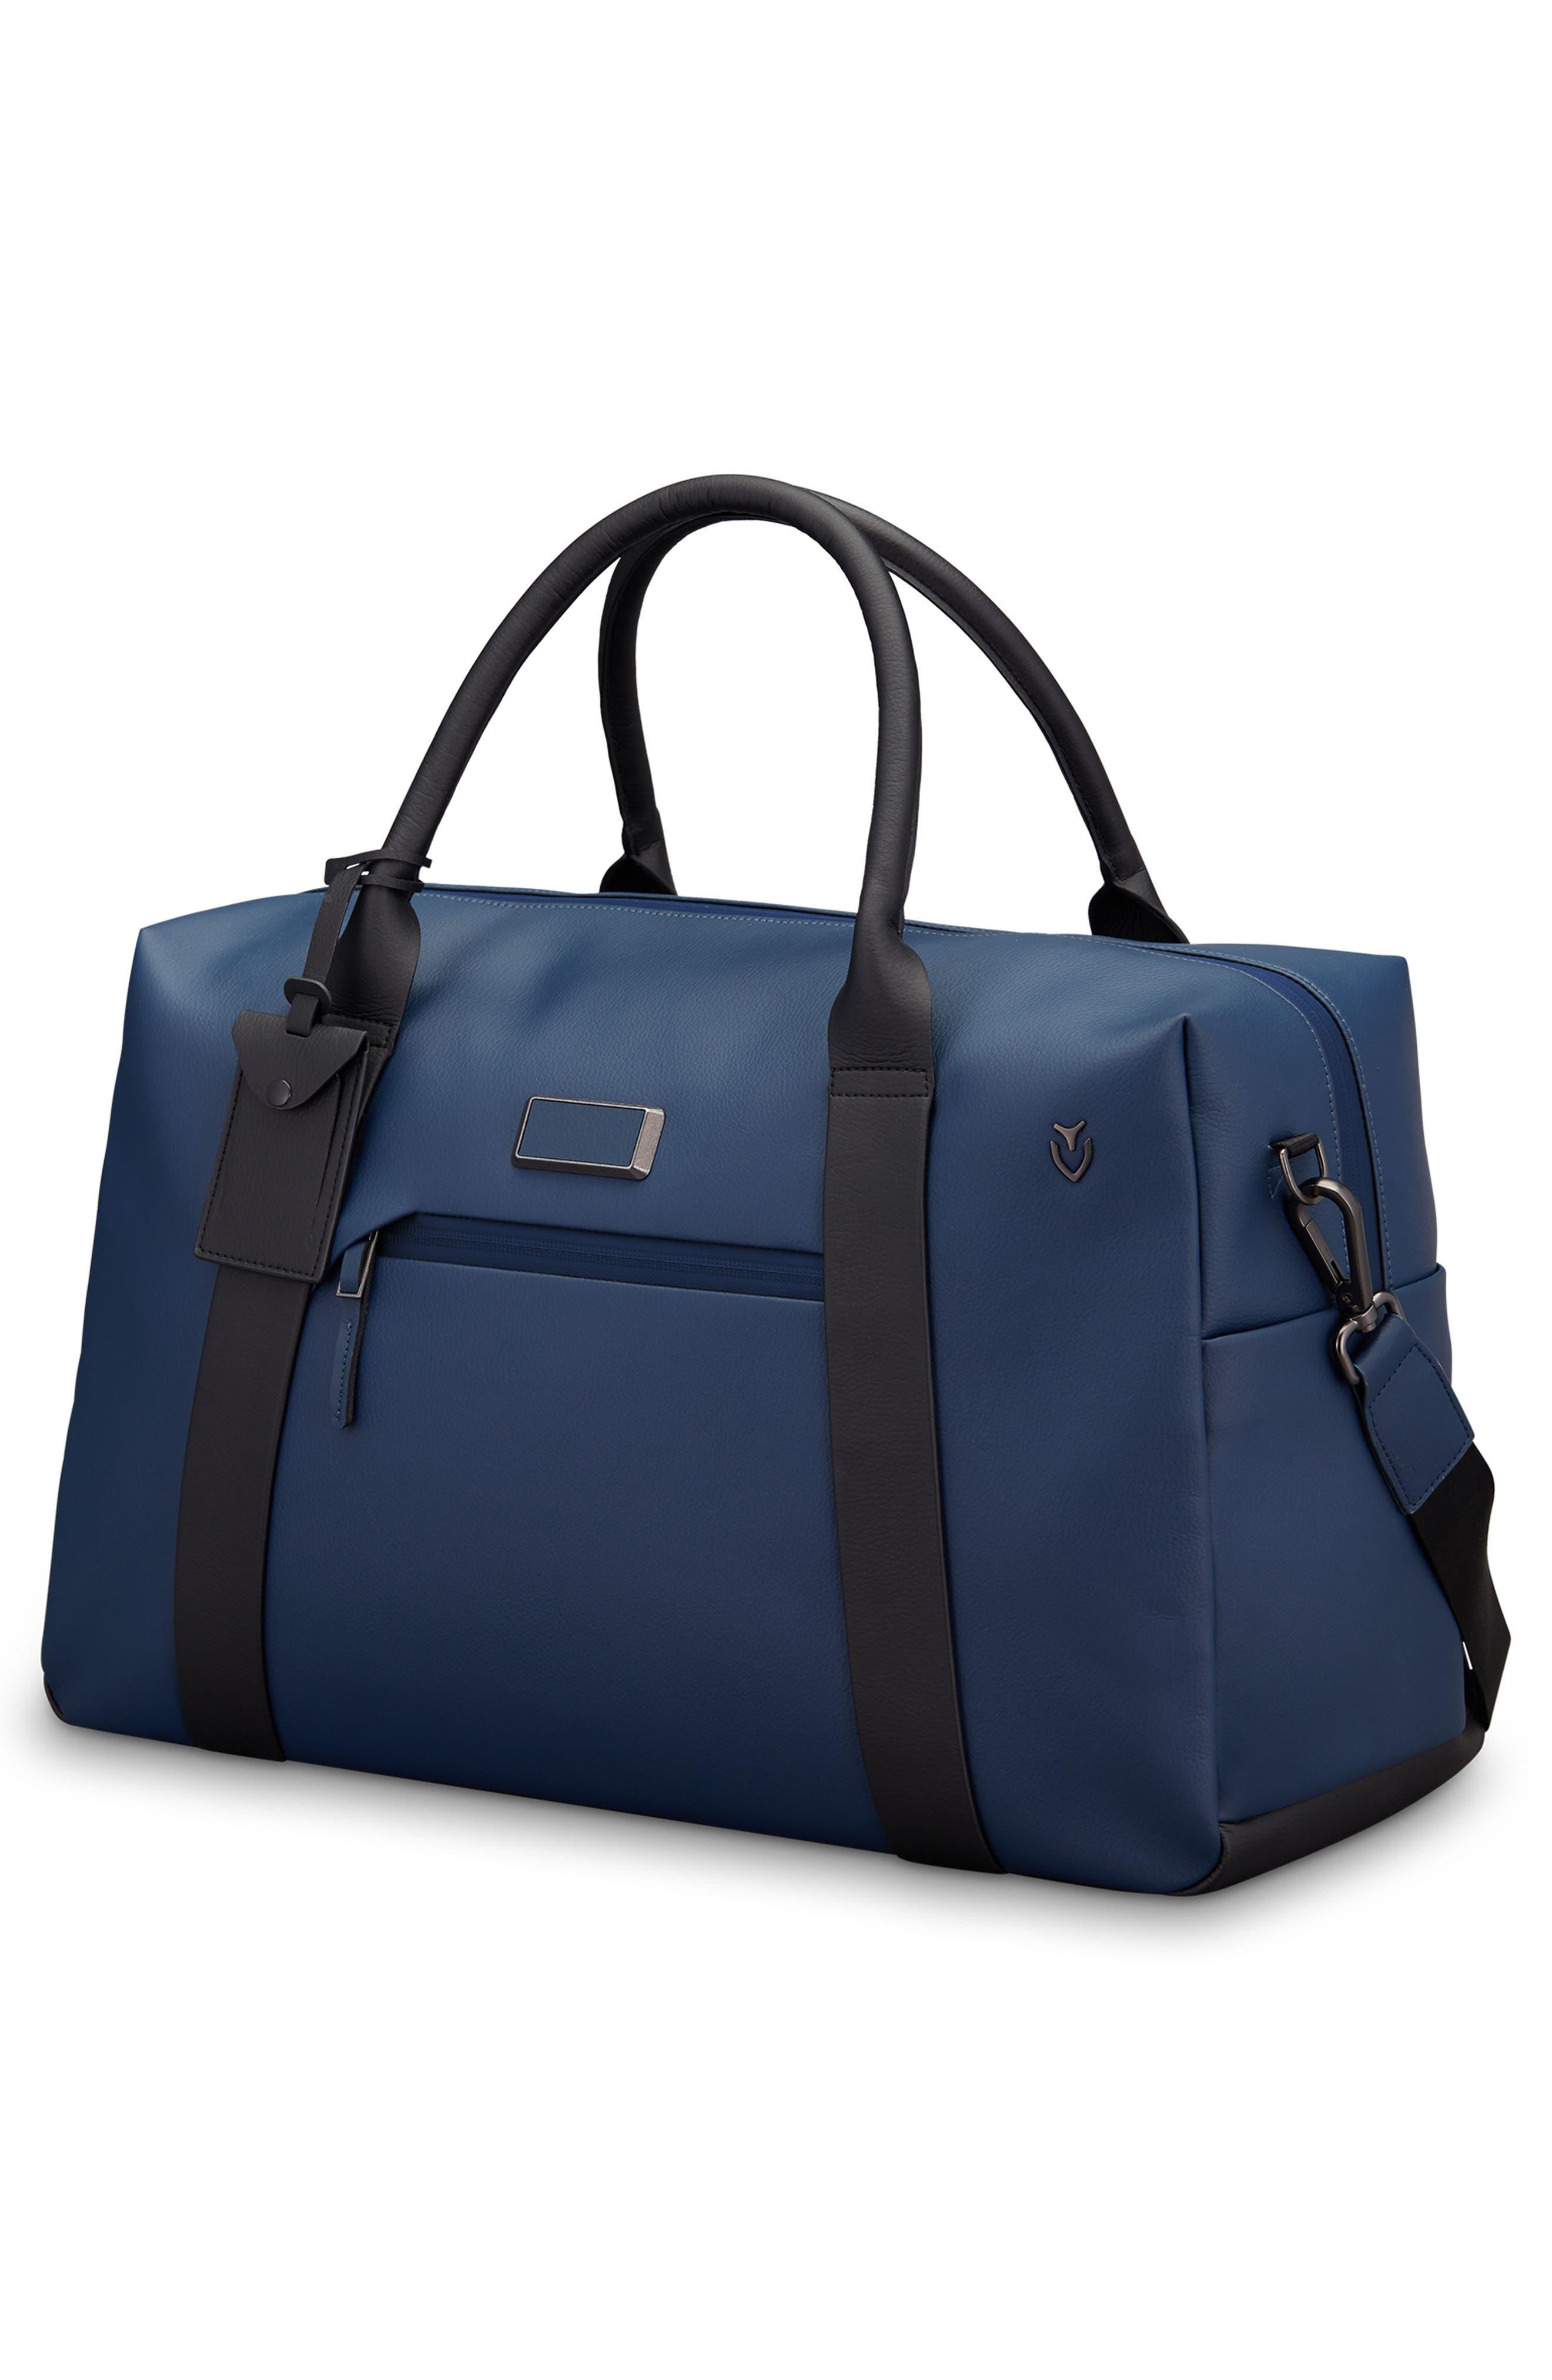 Signature 2.0 Faux Leather Duffel Bag,                             Alternate thumbnail 3, color,                             PEBBLED NAVY/ BLACK